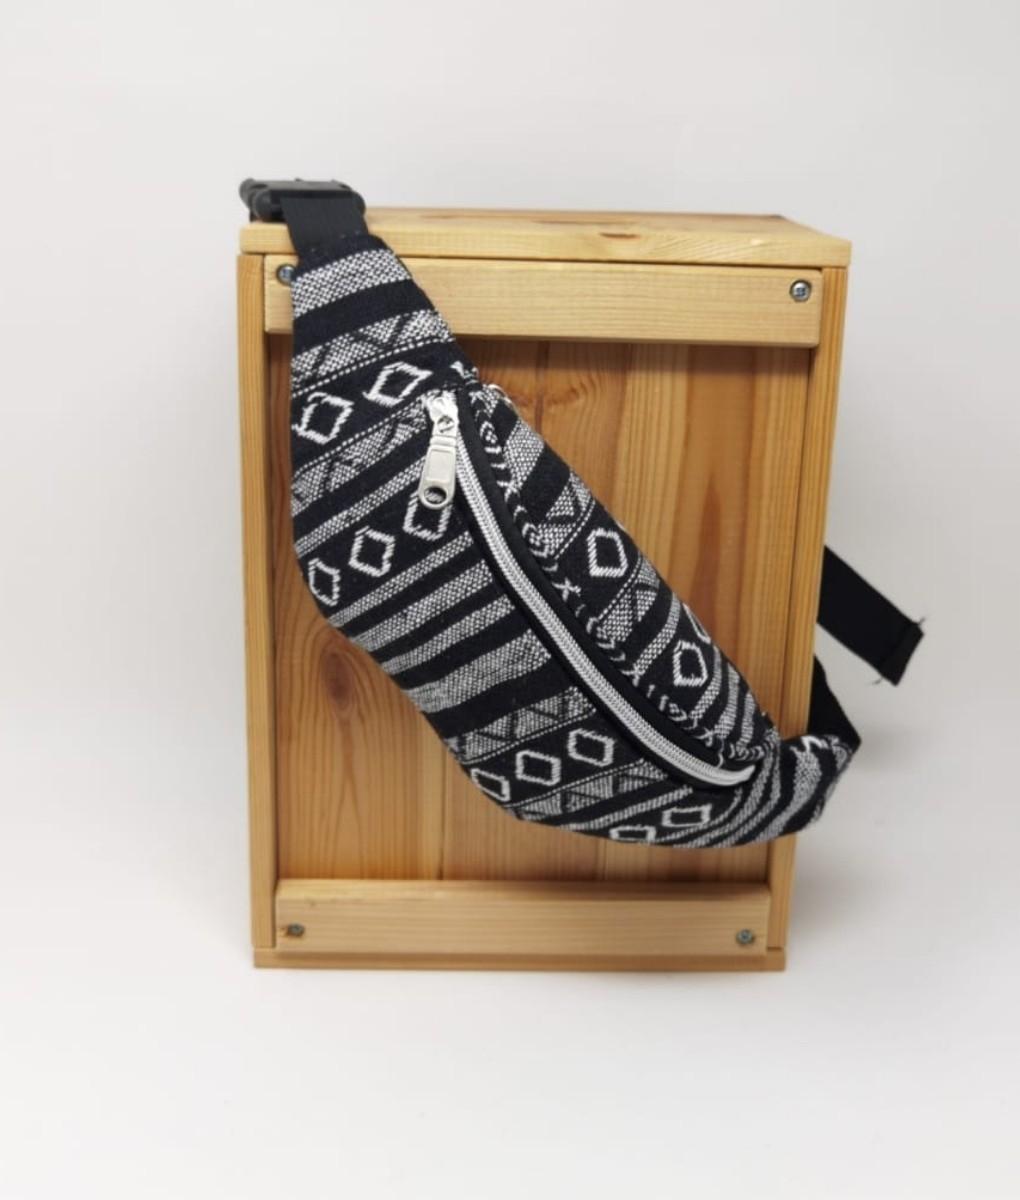 saipa waist bag - WHITE AND BLACK